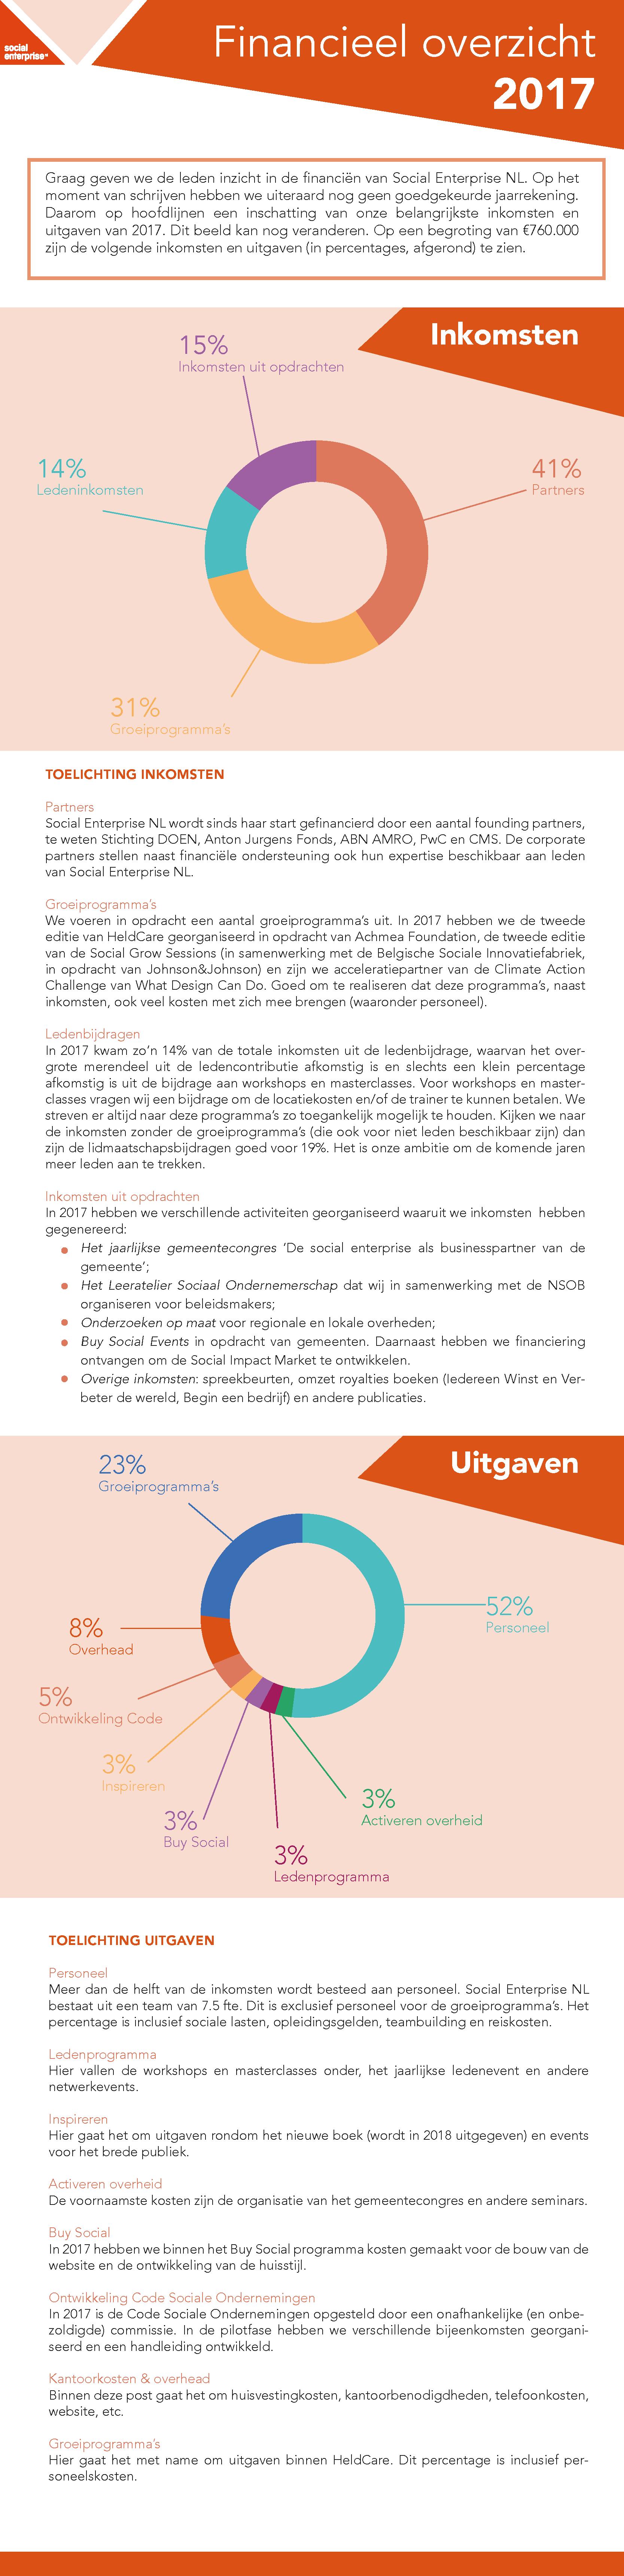 Financieel overzicht 2017 Social Enterprise NL.png